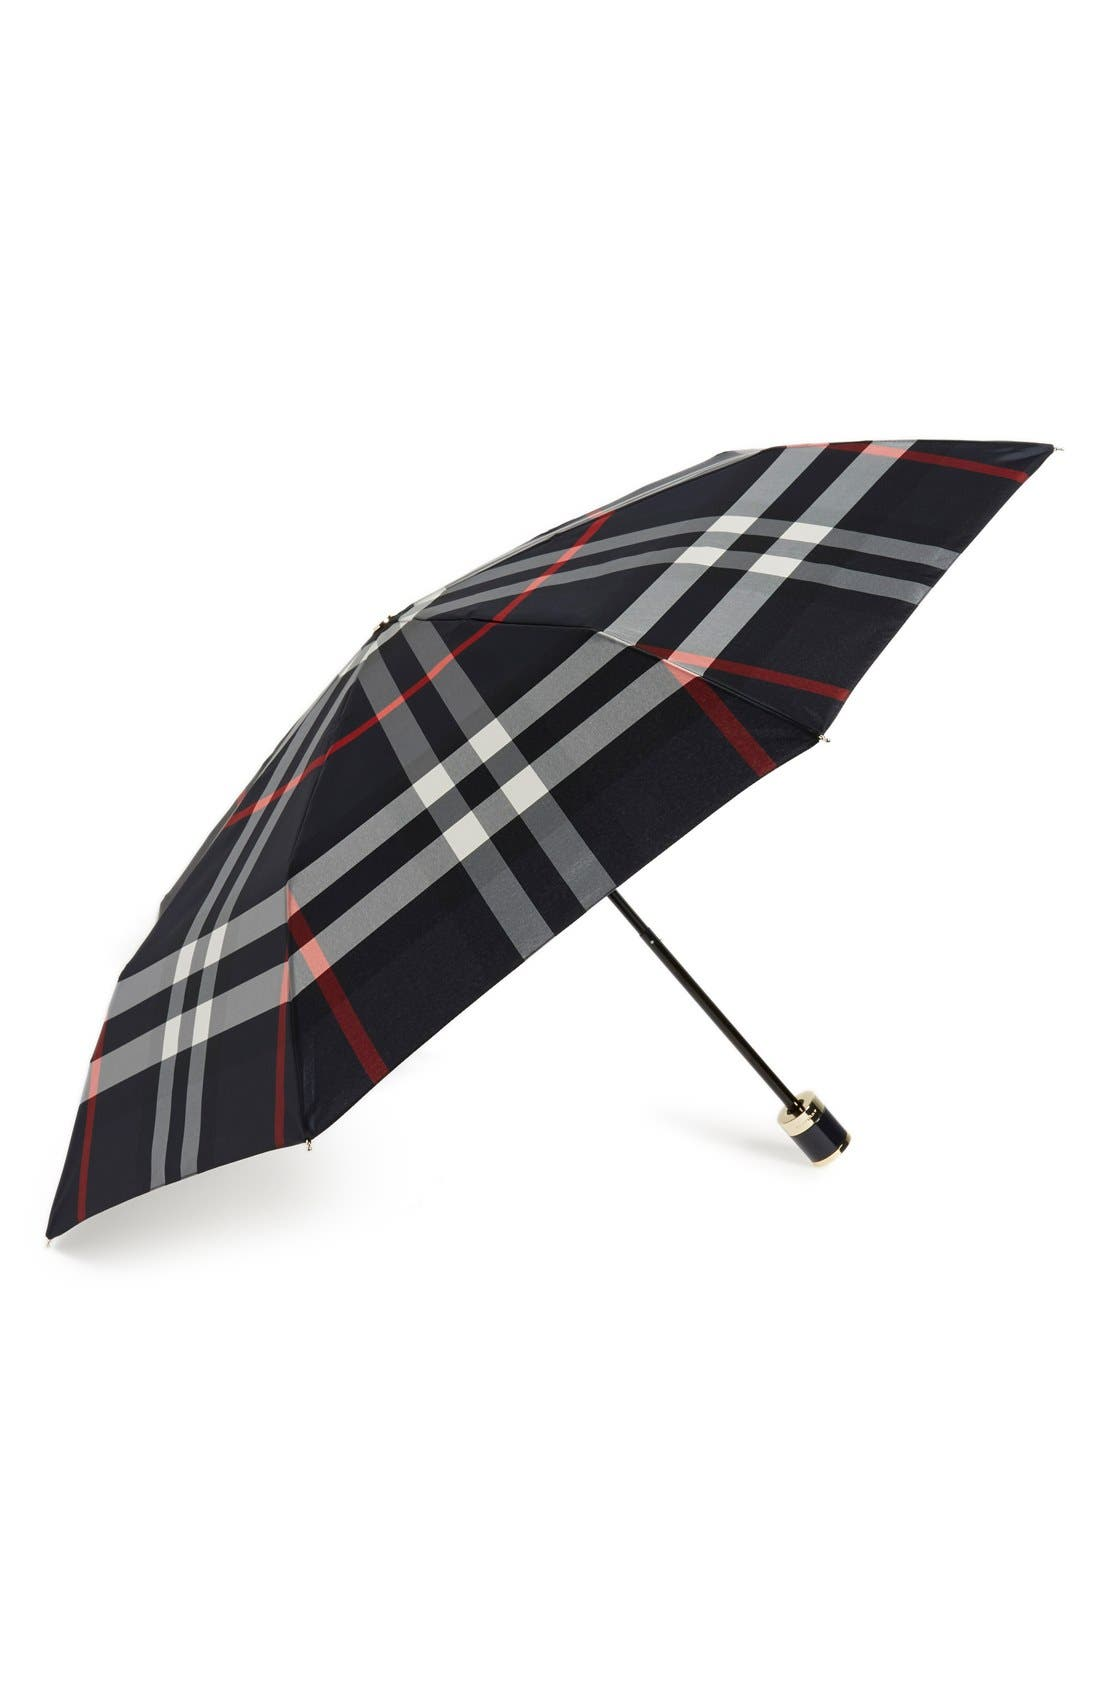 Burberry 'Trafalgar' Check Folding Umbrella